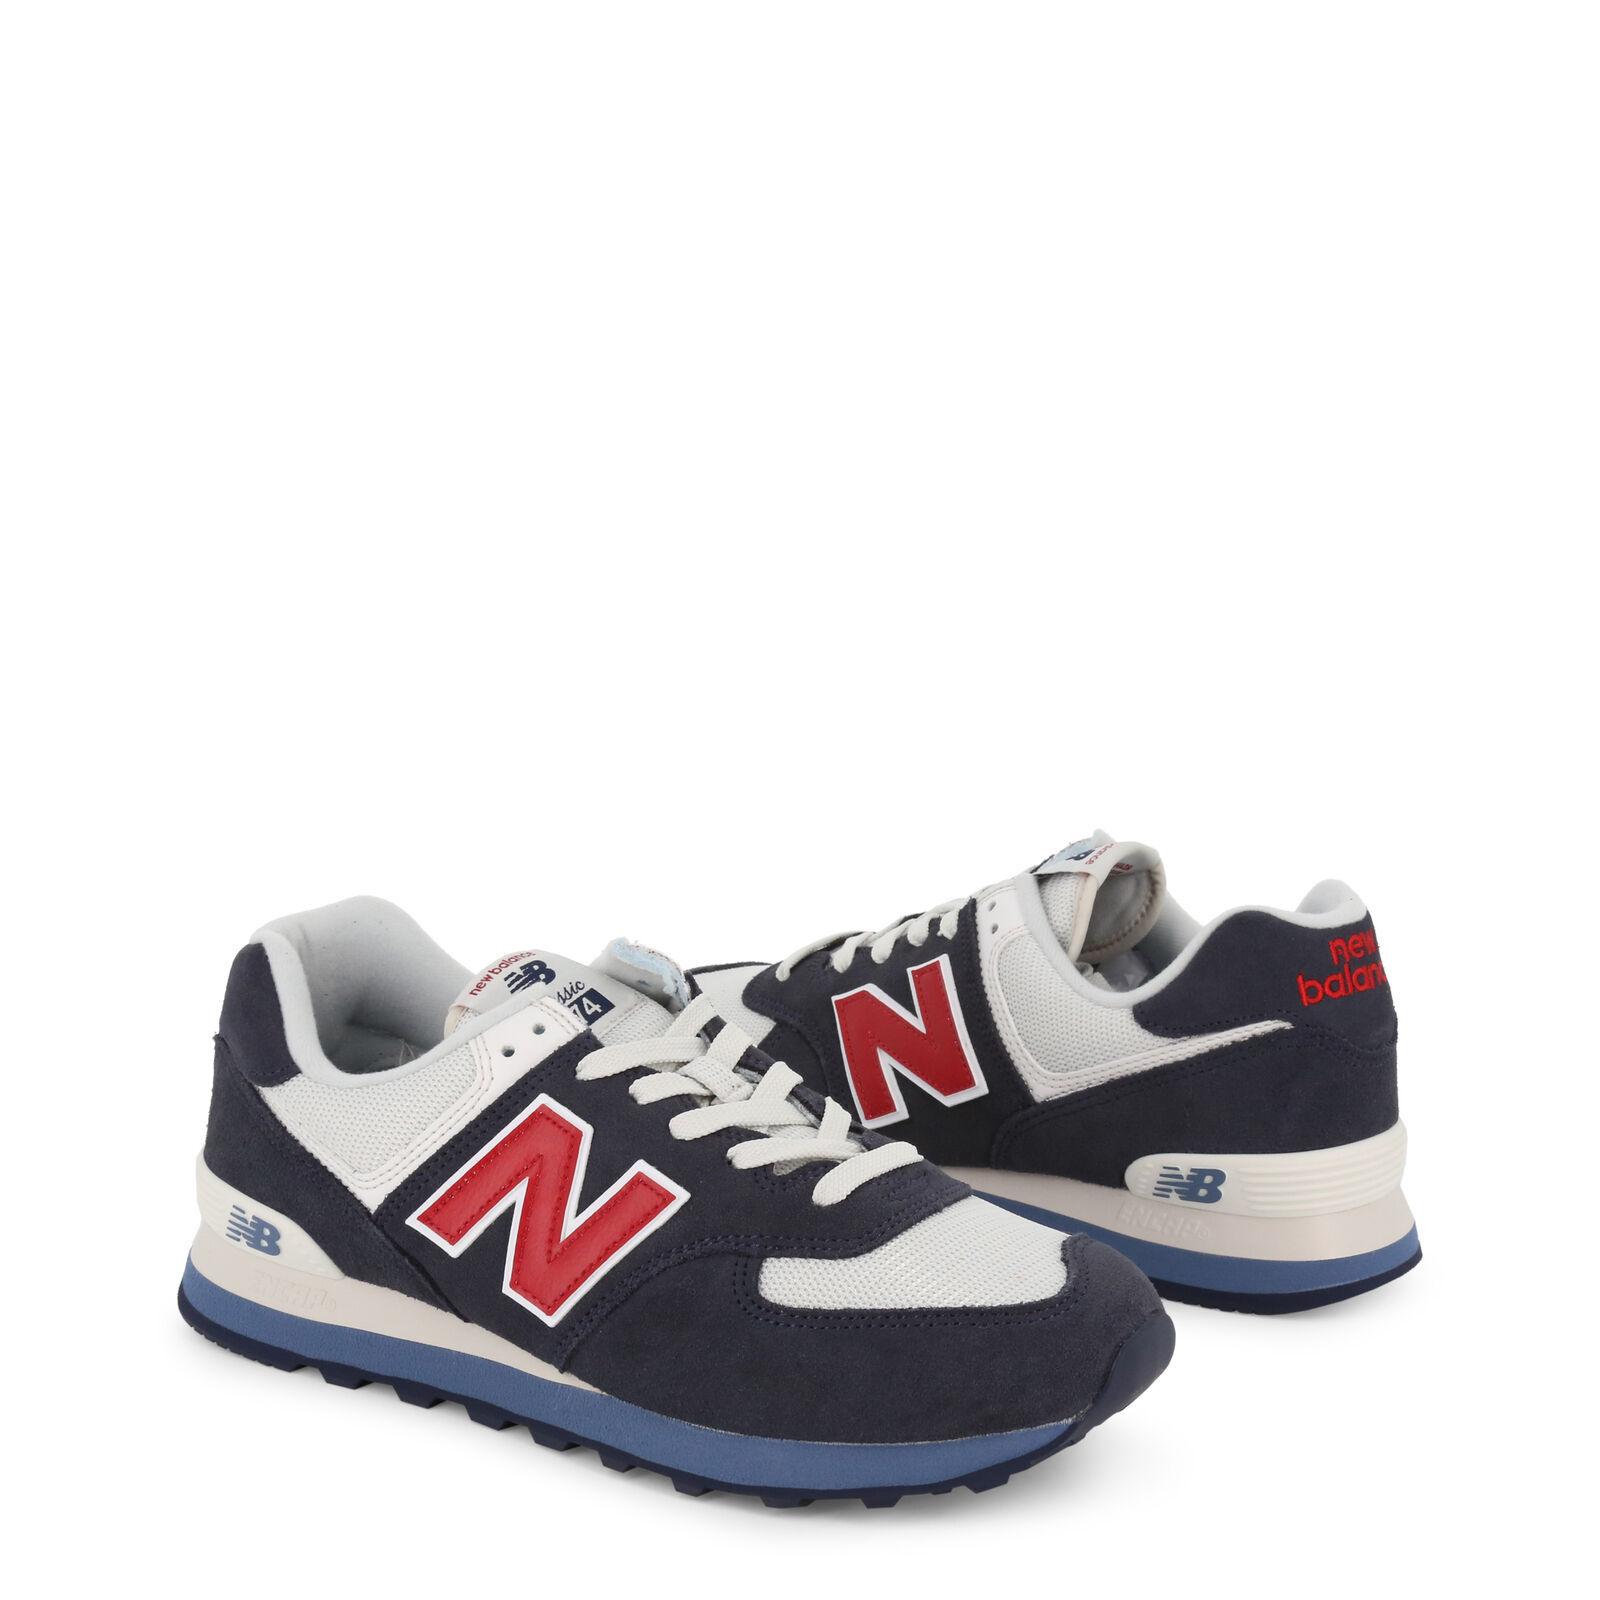 New Balance 574 Series Herren Schuhe Rot/Schwarz/Blau/Grau Suede Sneakers